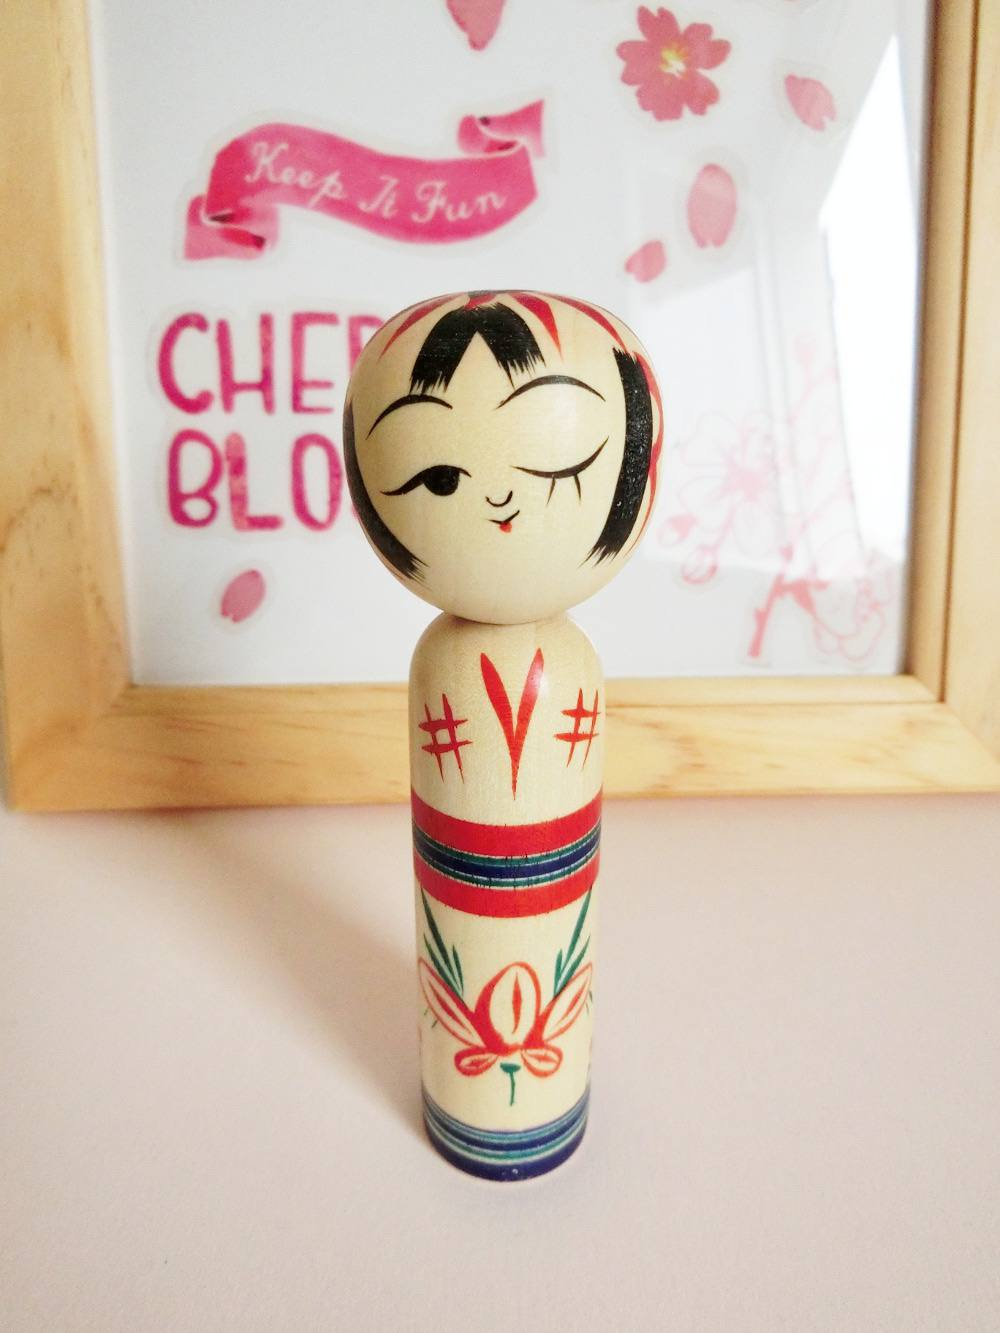 Back in stock! - Wink kokeshi doll by Kanou Hiroshi